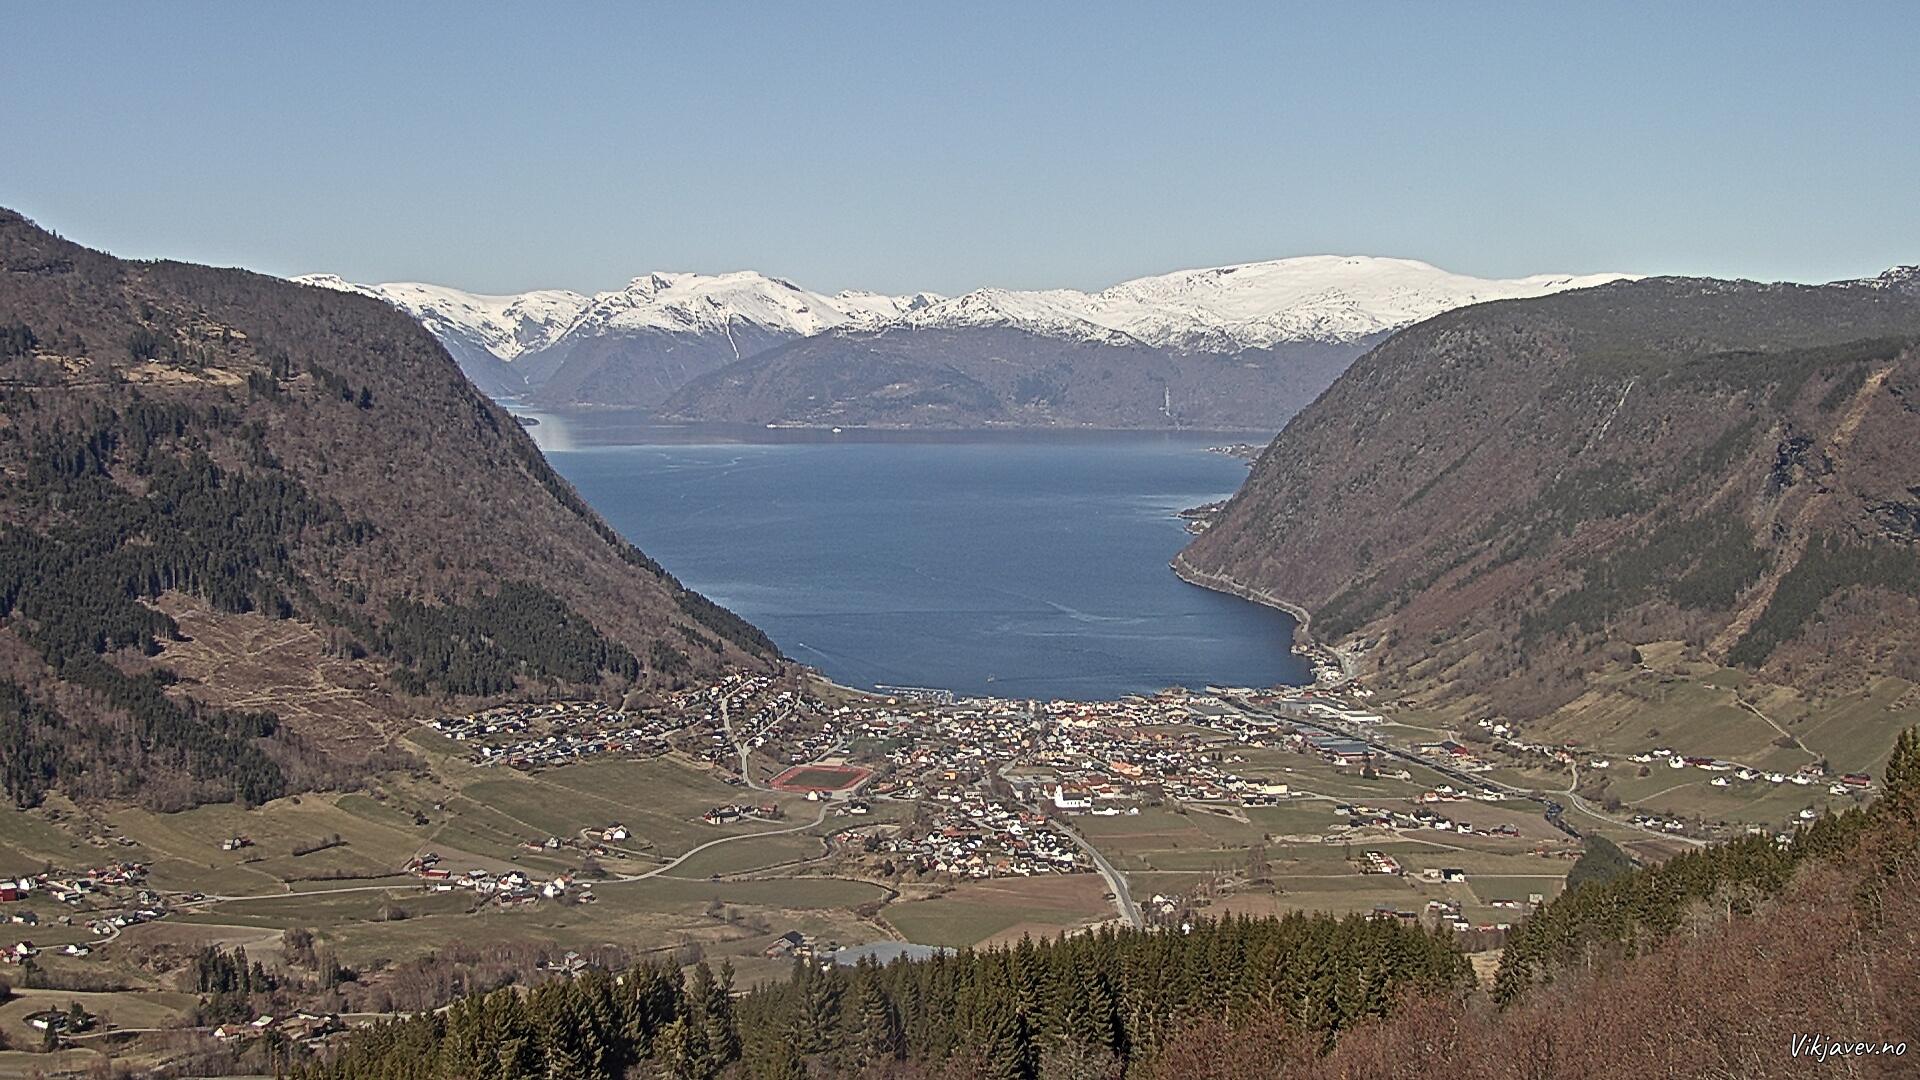 Vik i Sogn April 12, 2019 15:00